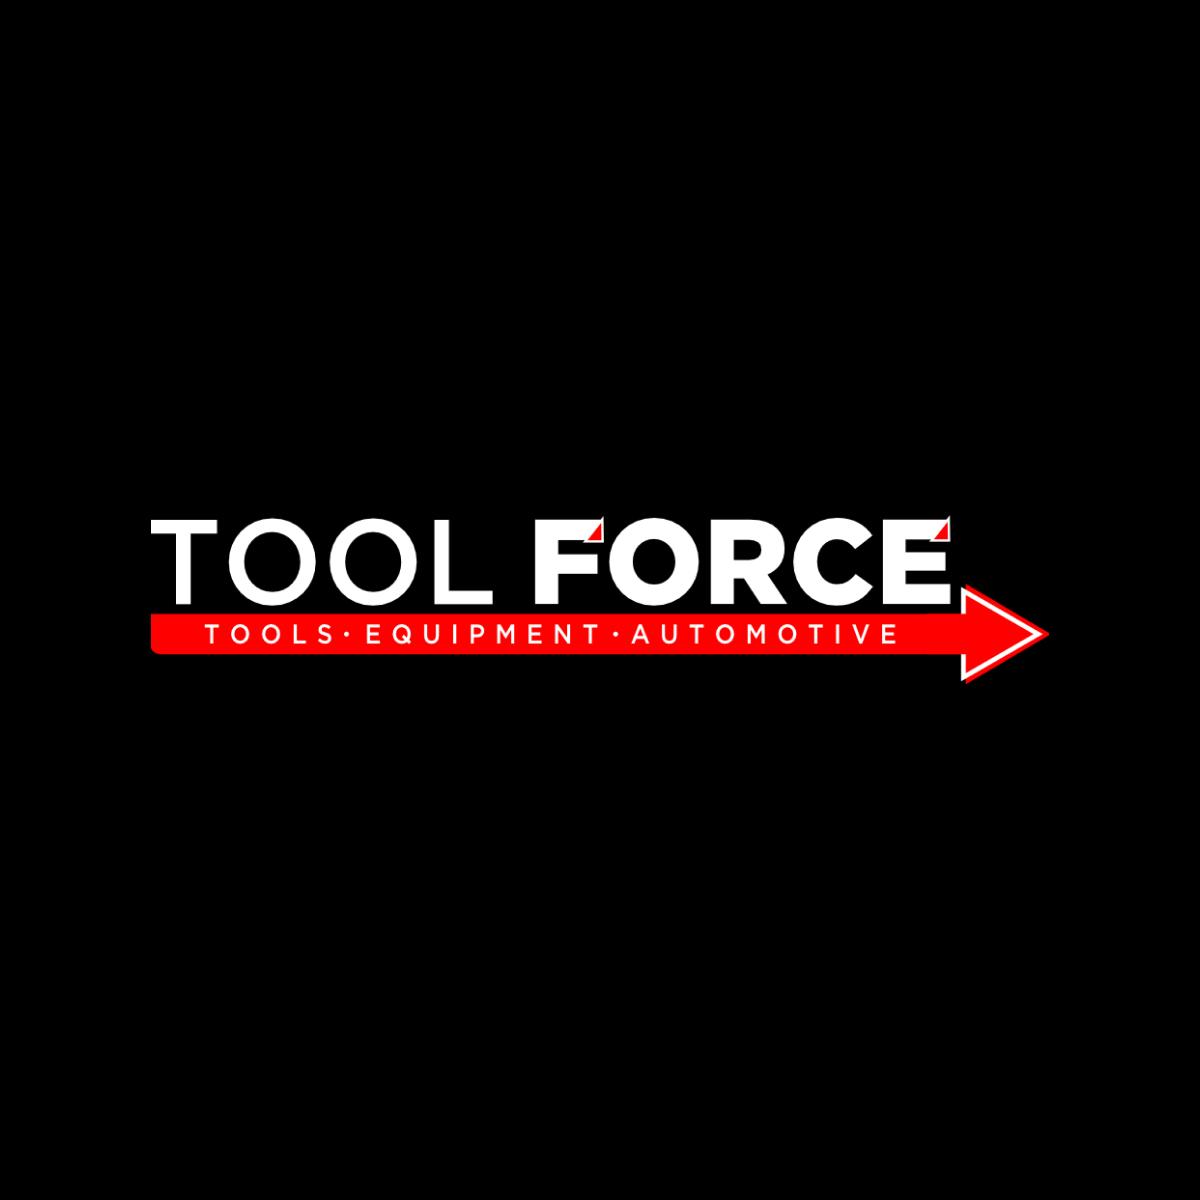 Toolforce